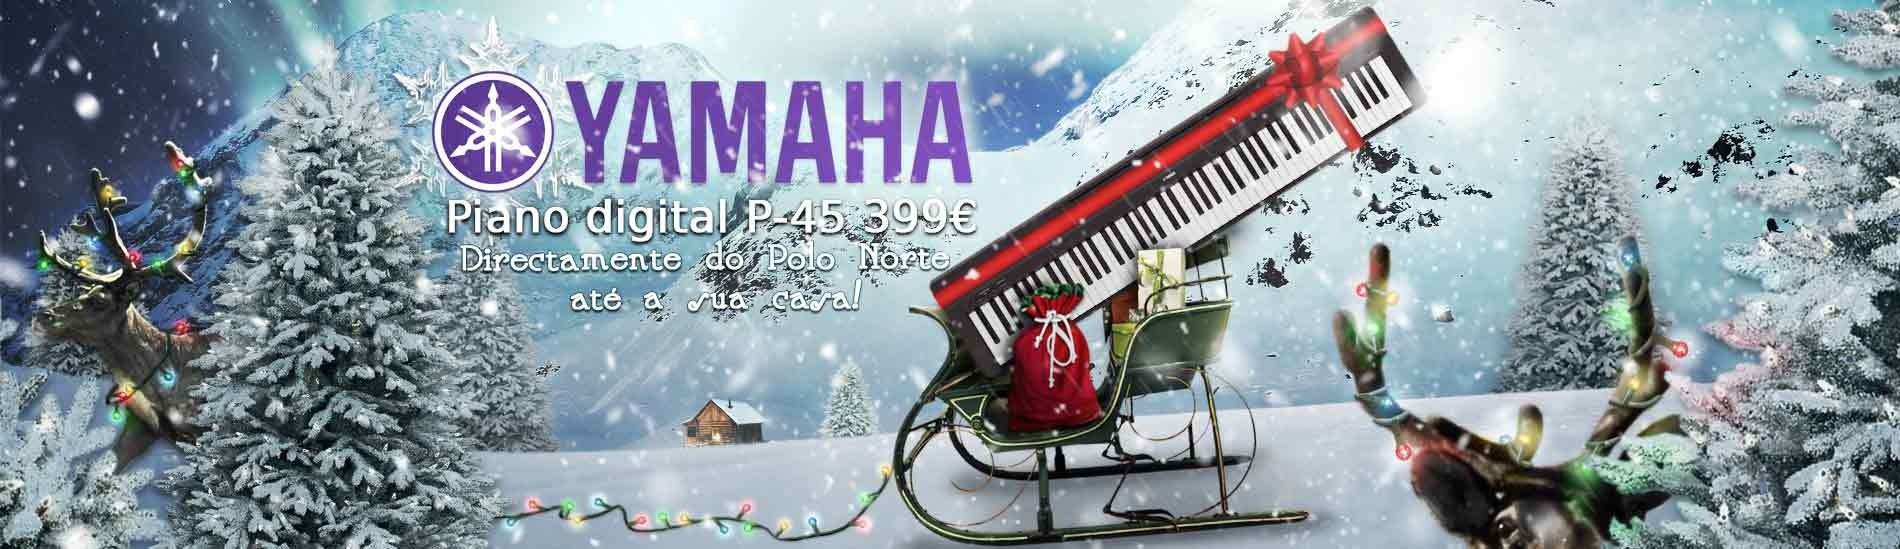 Piano Digital Yamaha P 45 88 Teclas